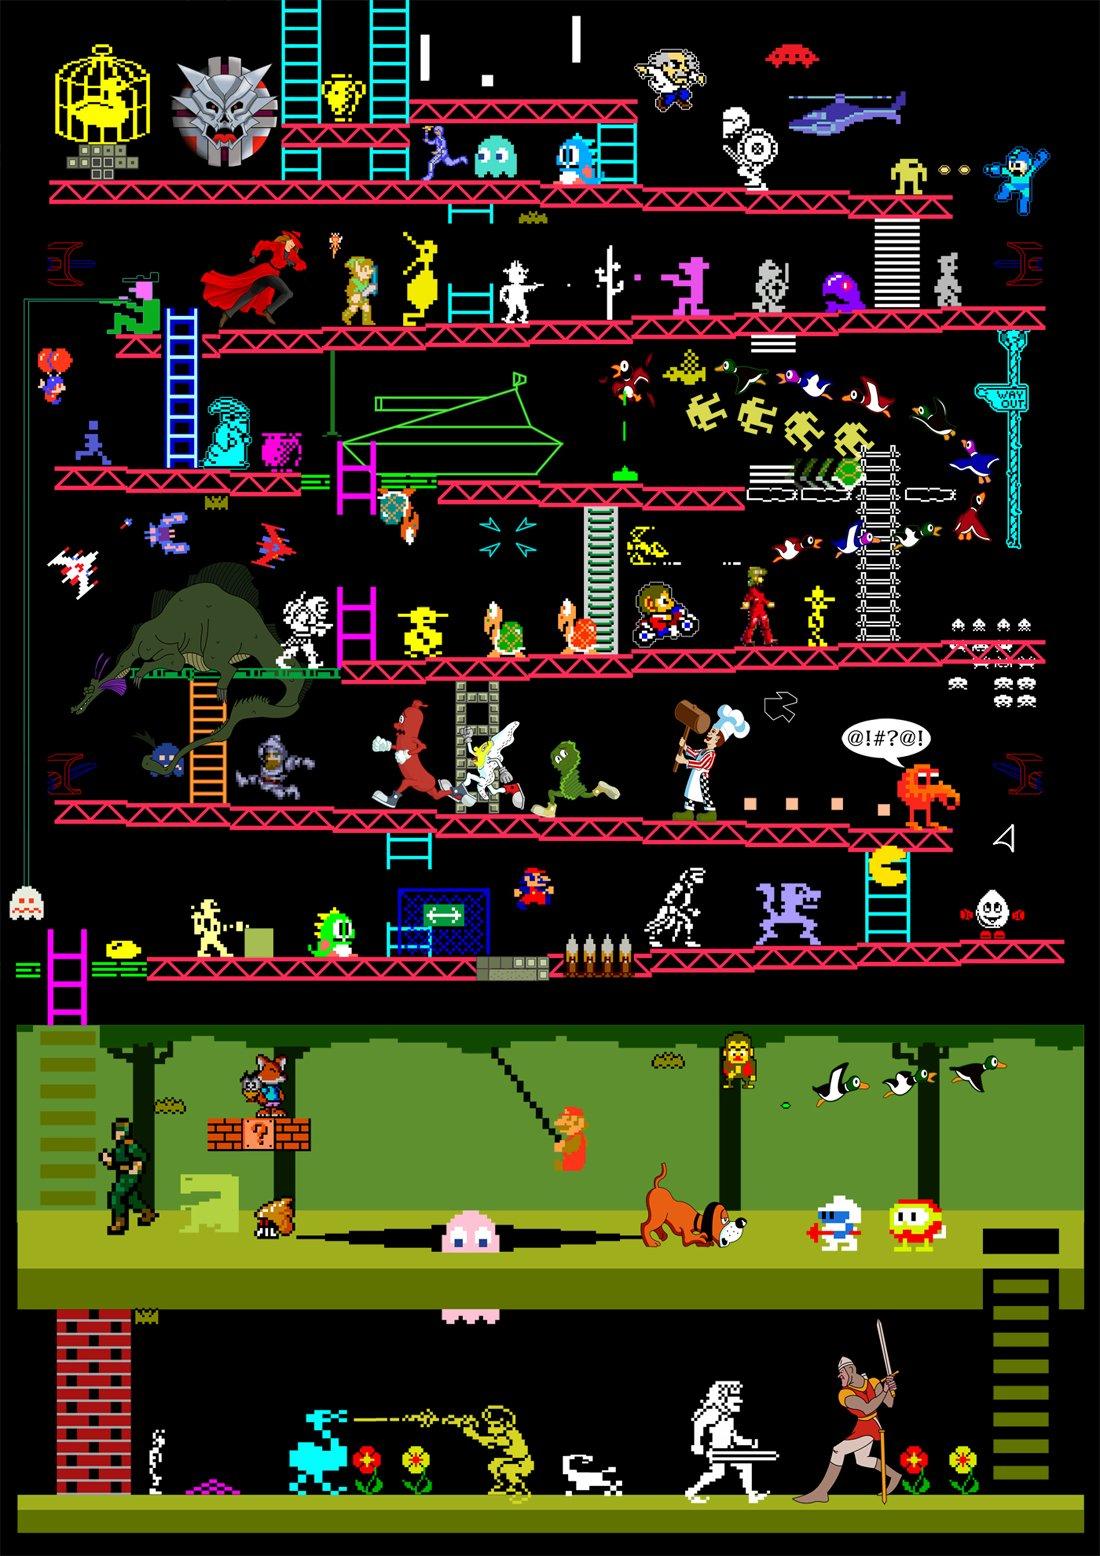 50 Retro Video Game Classics In One Illustration - ChurchMag